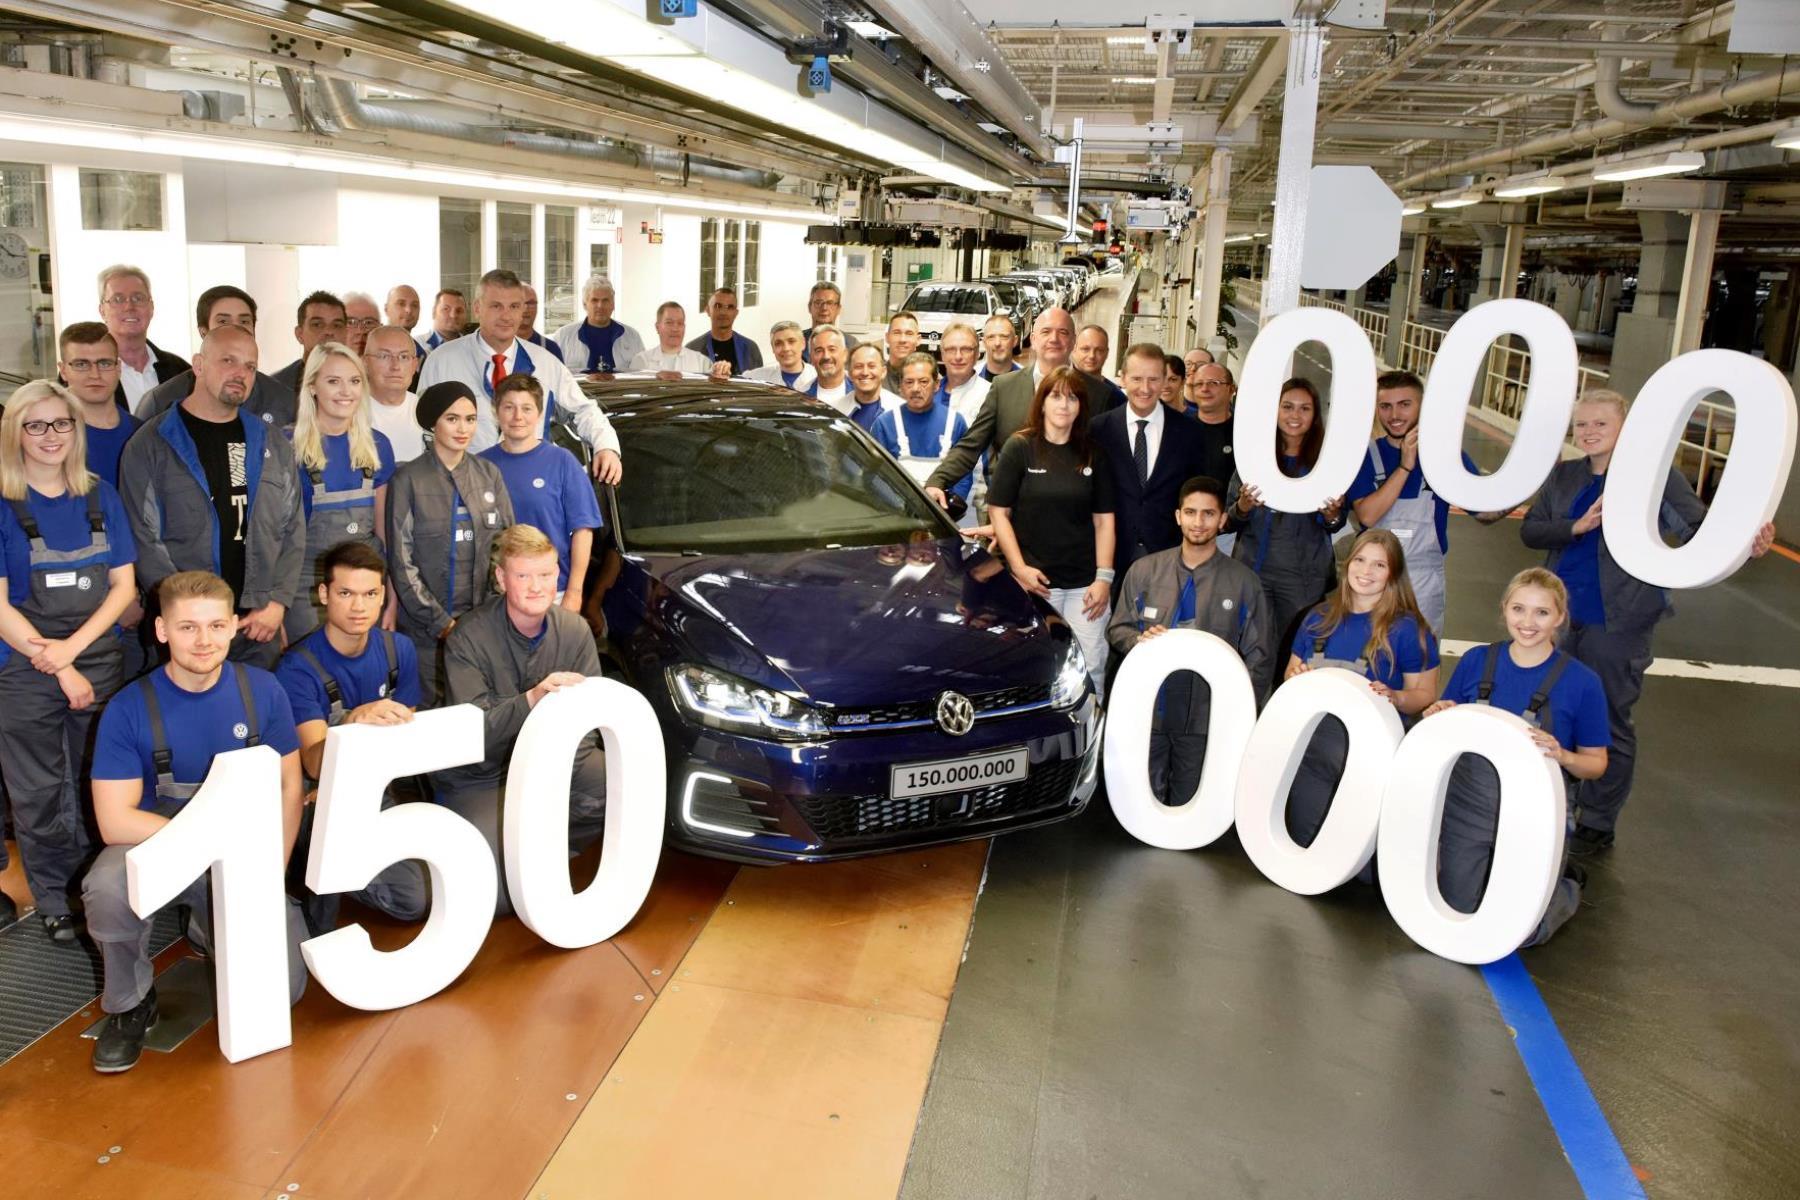 150 million vehicle milestone for Volkswagen